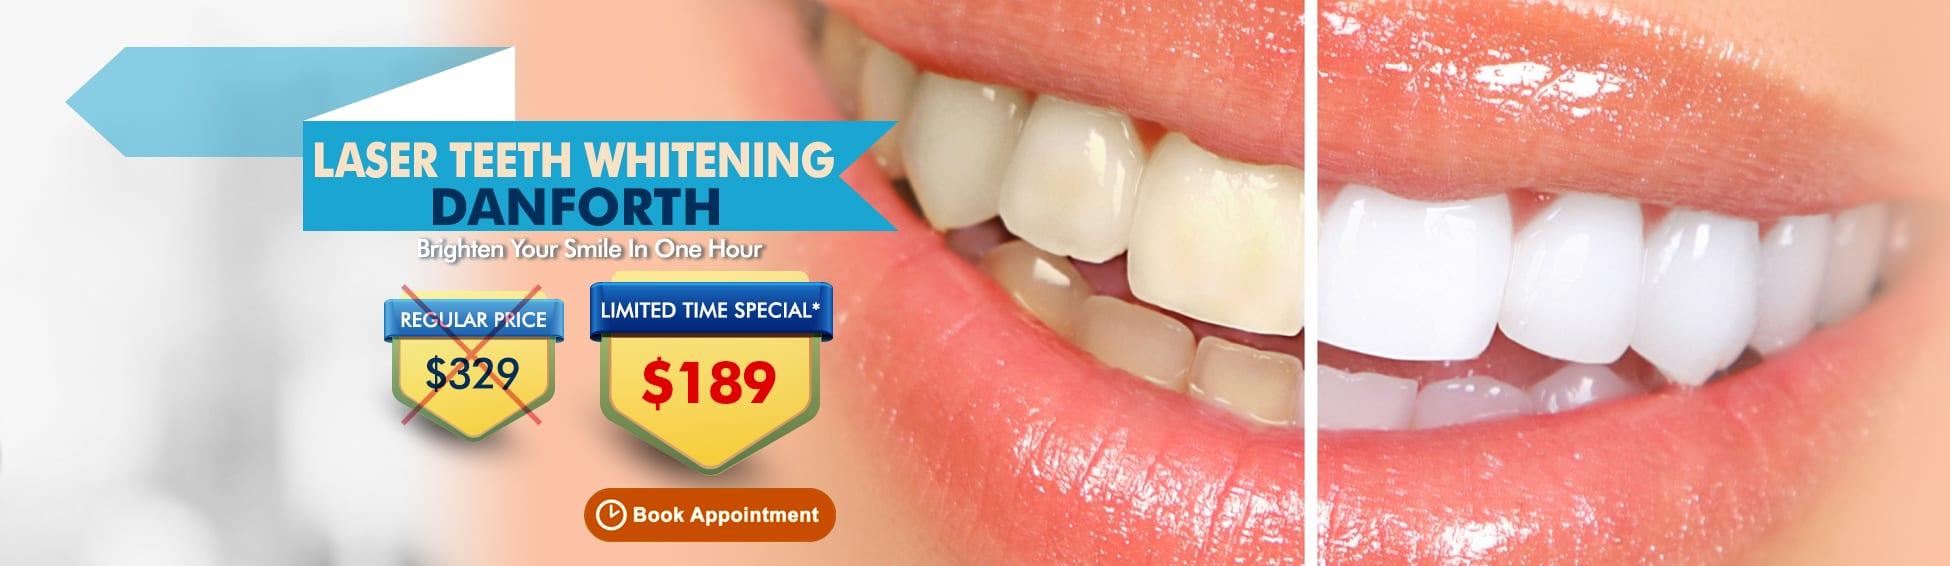 Laser Teeth Whitening Danforth - $329 $189